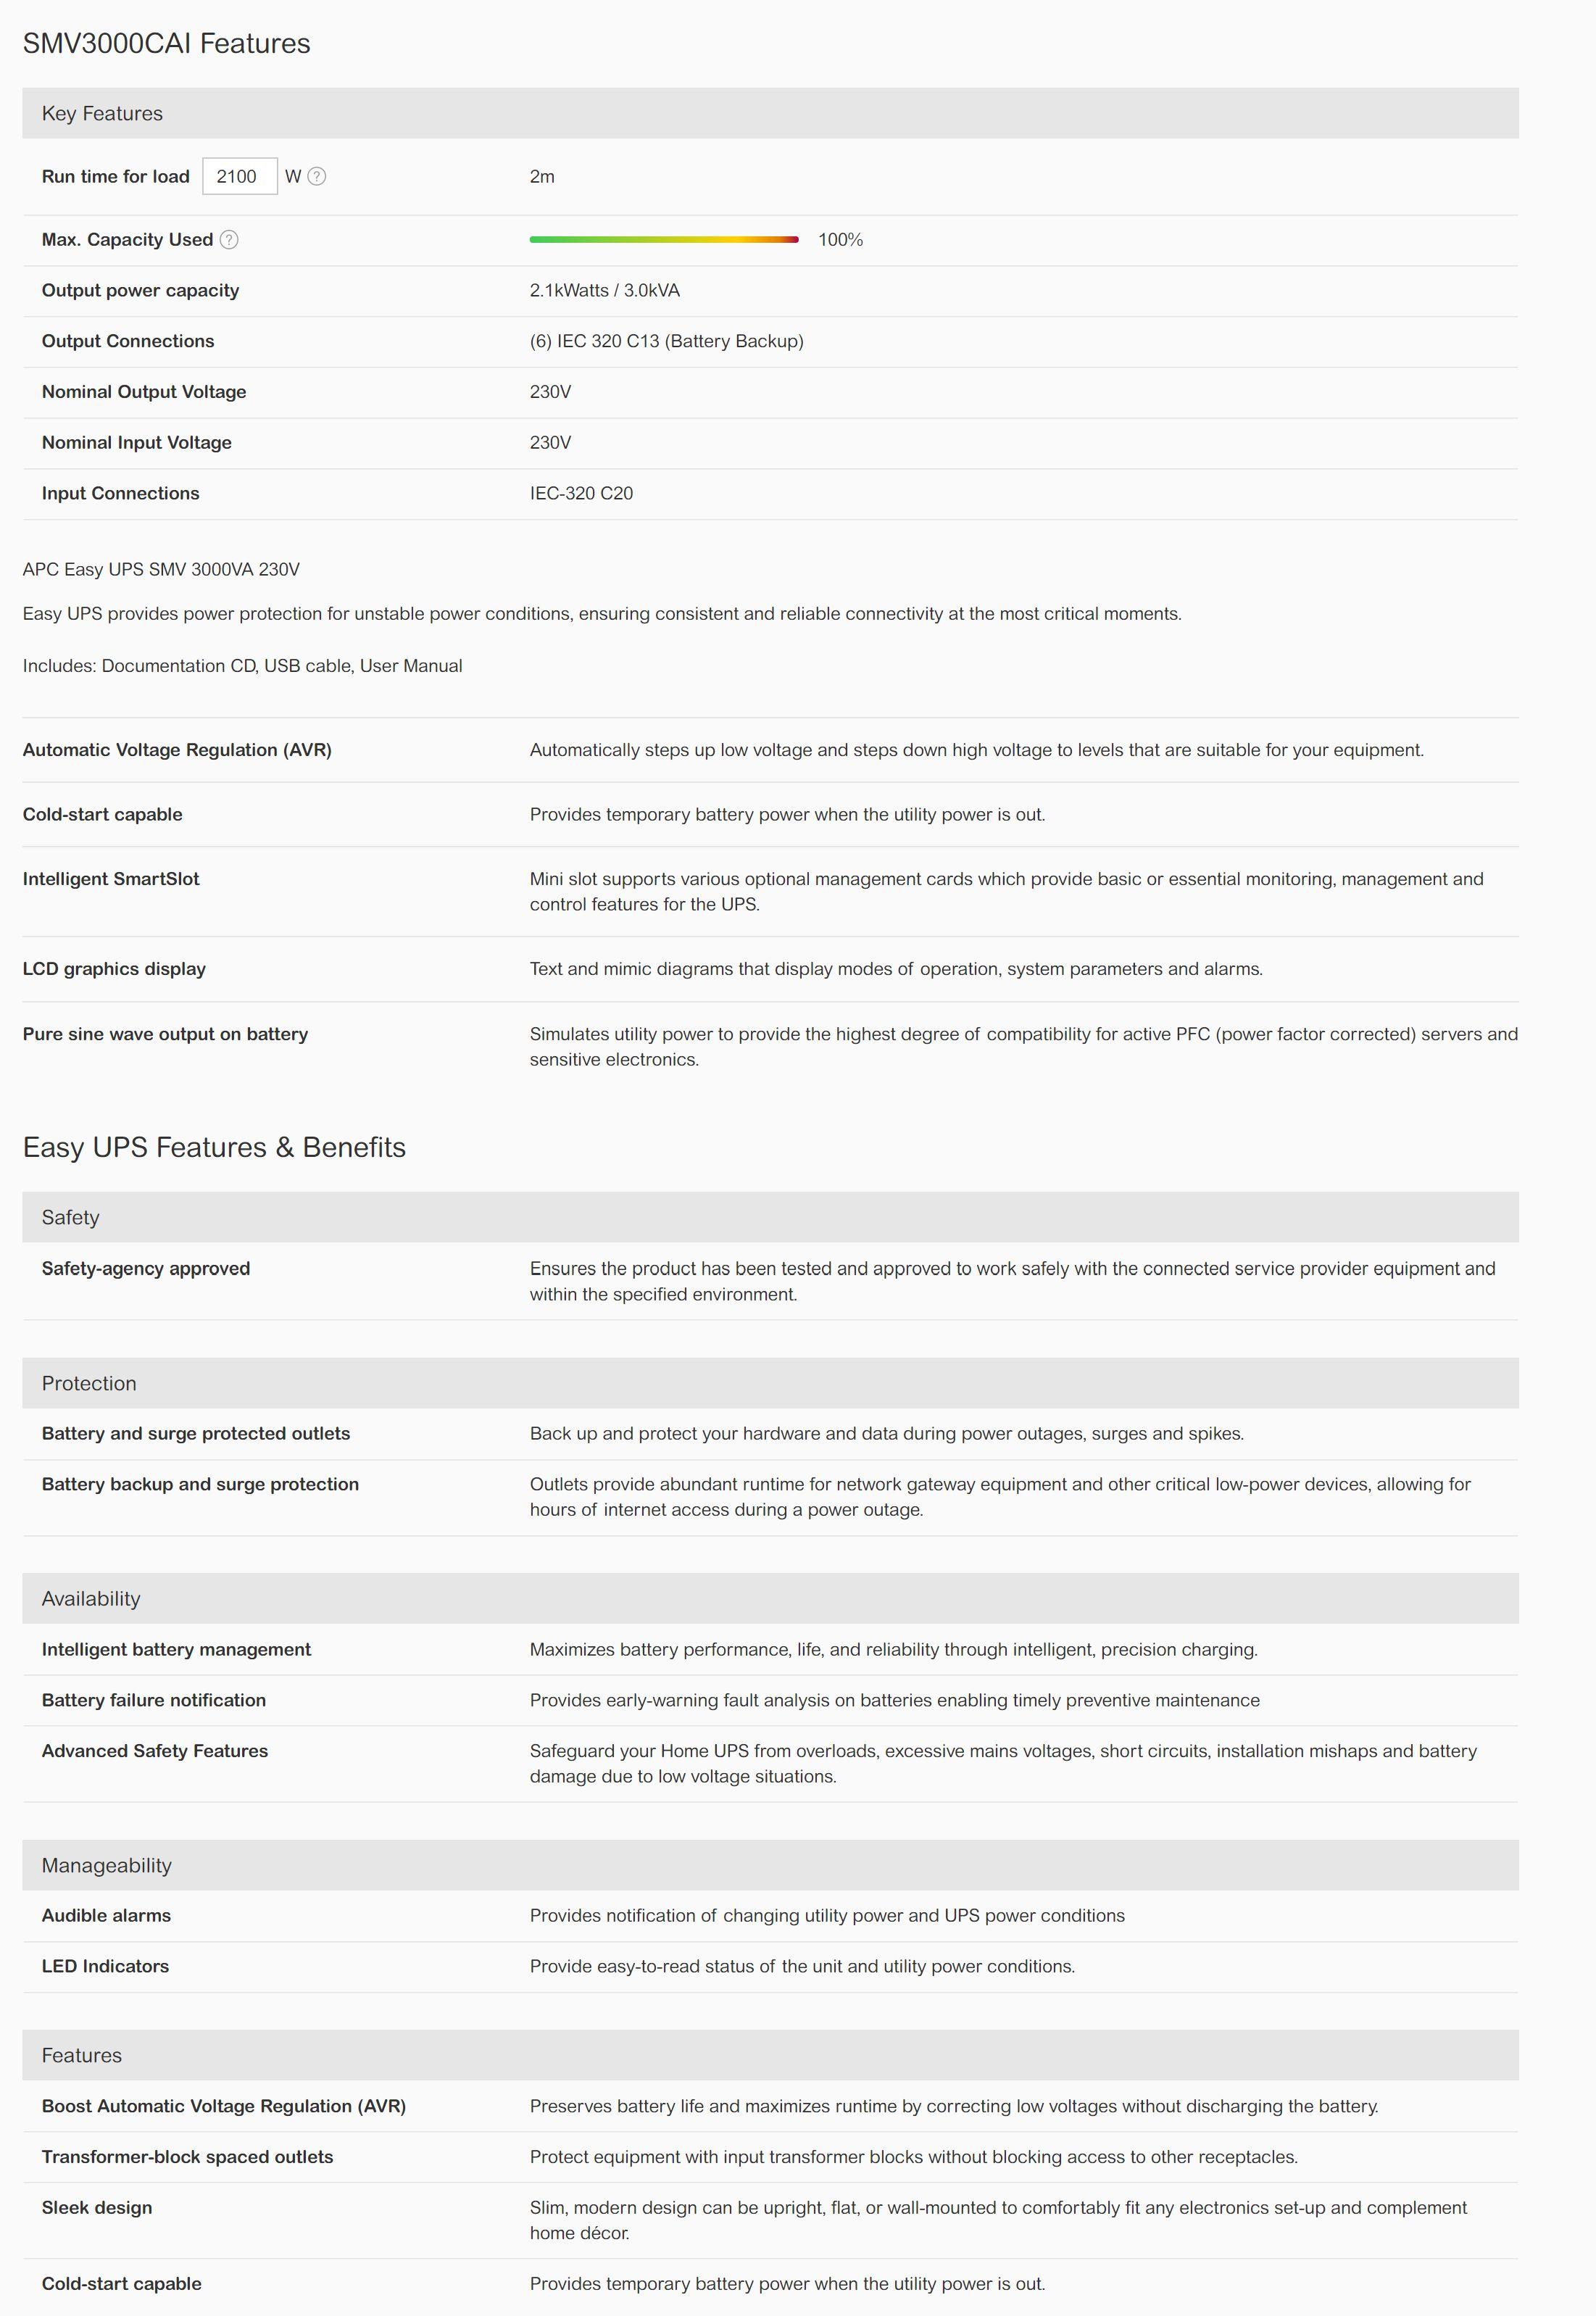 #1801 - 'APC Easy UPS SMV 3000VA 230V-APCCroatia' - www_apc_com.jpg